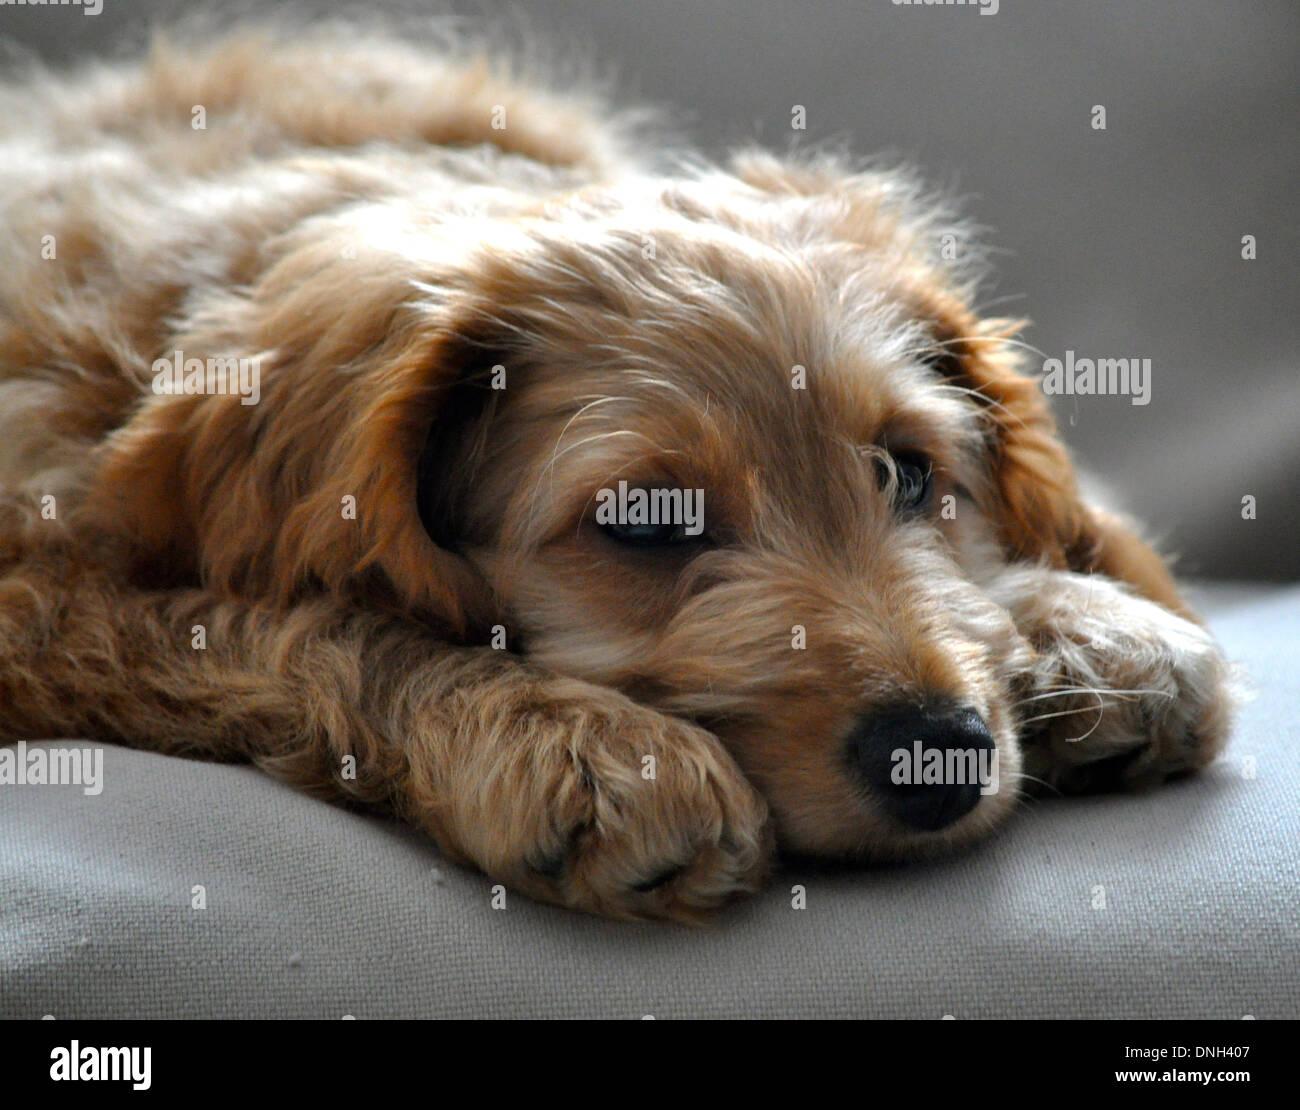 Golden Puppy Dog Looks Sad With Puppy Dog Eyes Stock Photo 64915207